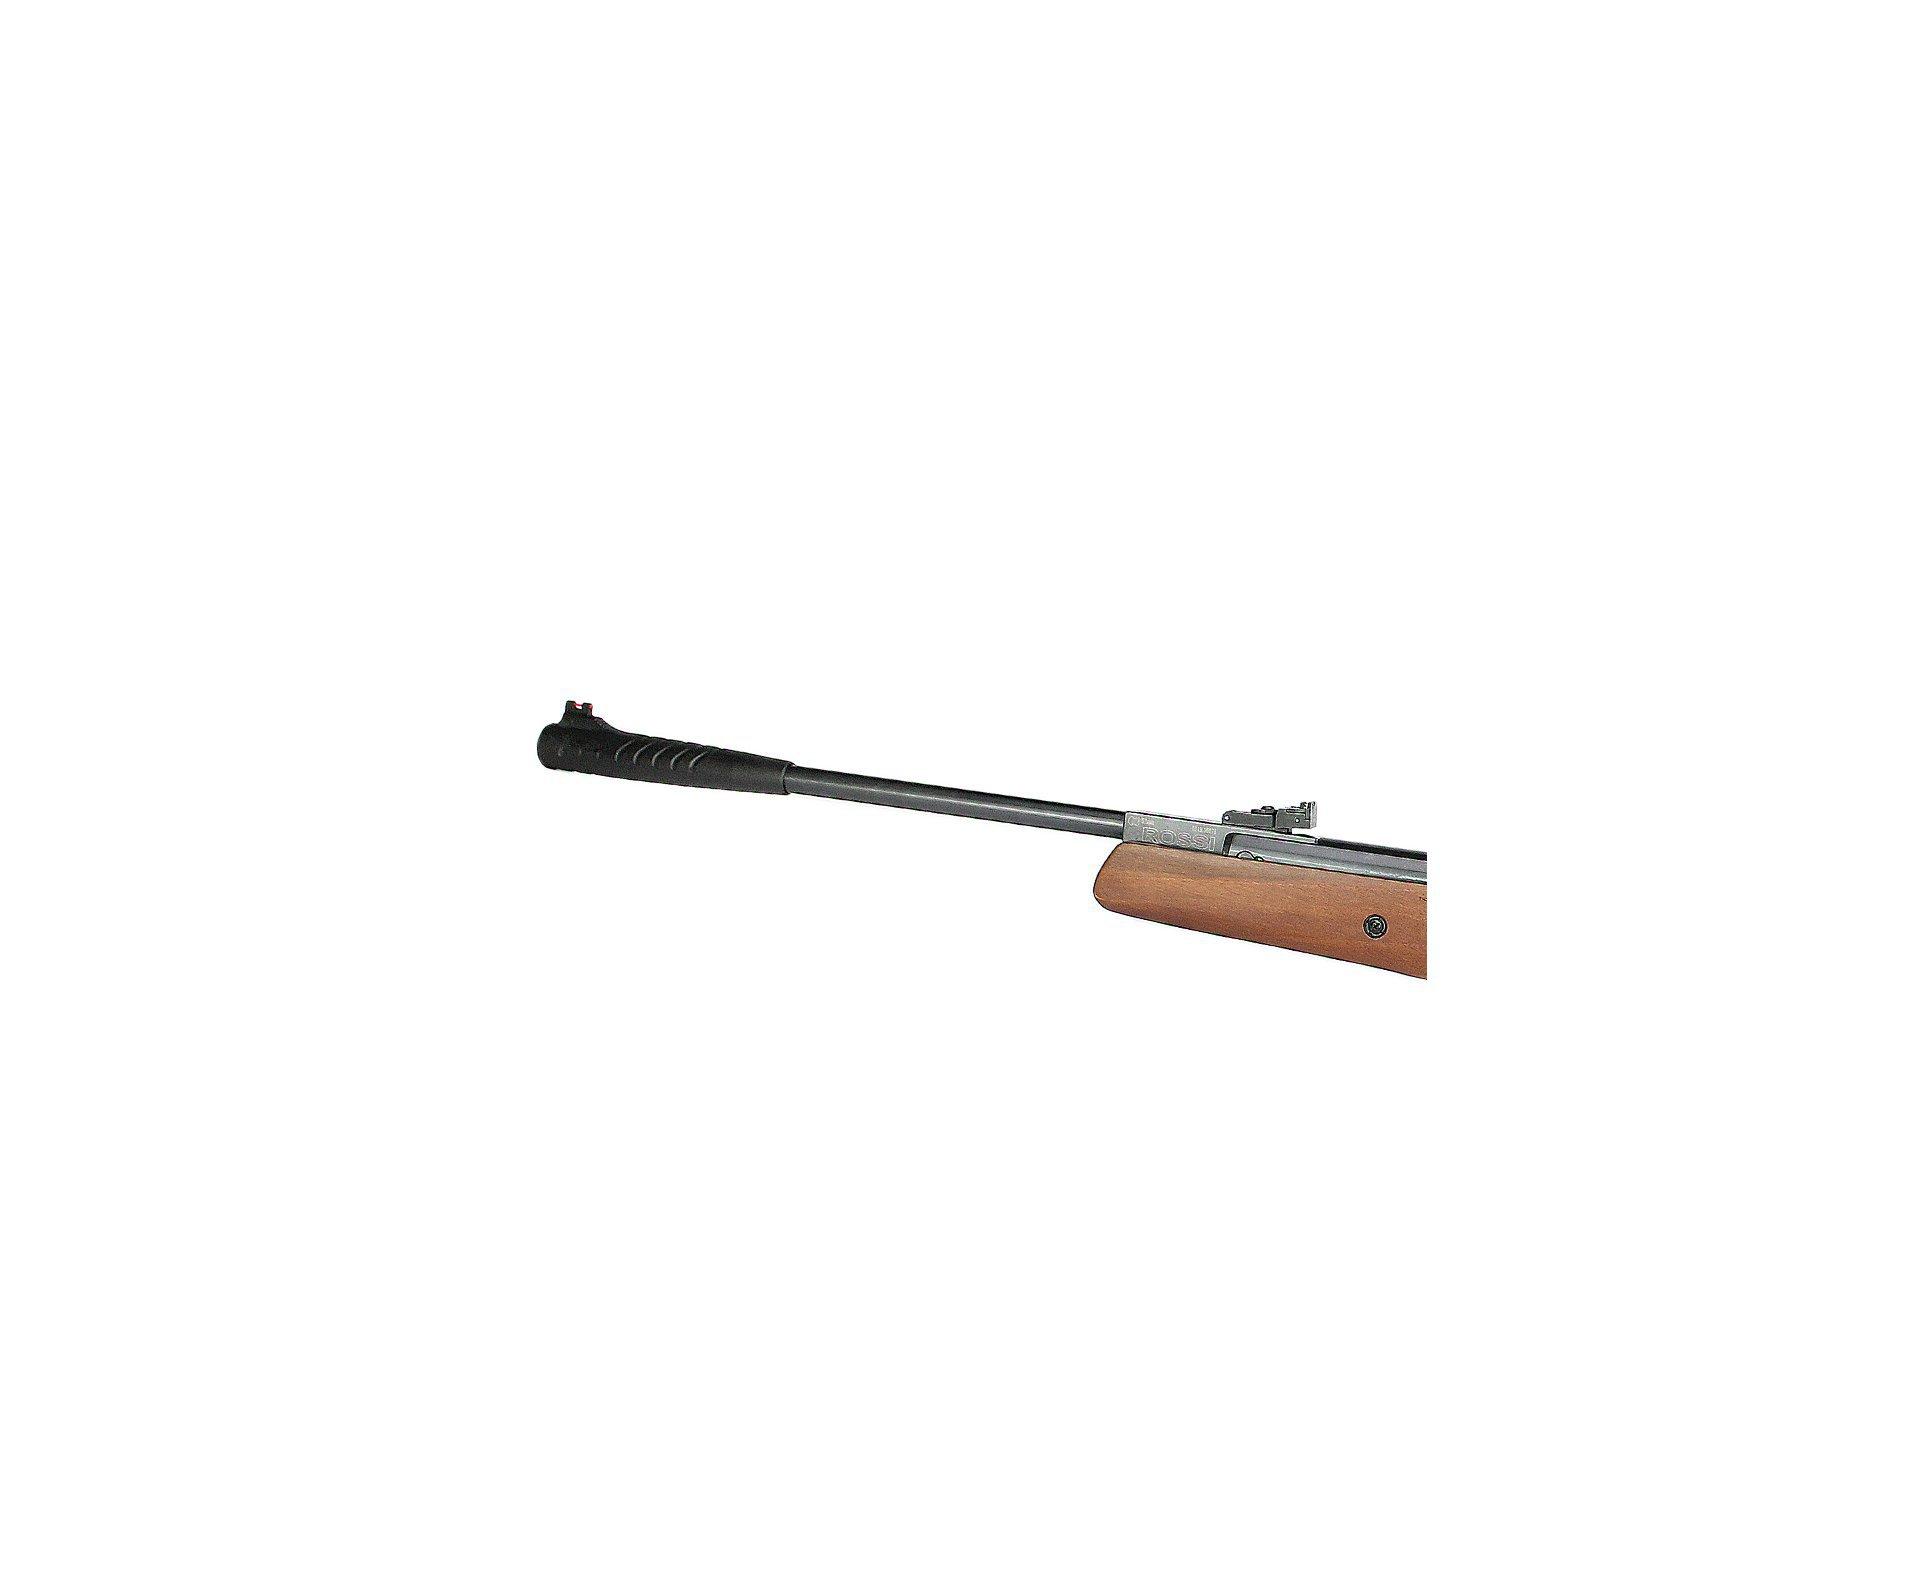 Carabina De Pressão Hatsan Ht 95 - Calibre 5,5 Mm Sistema Sas